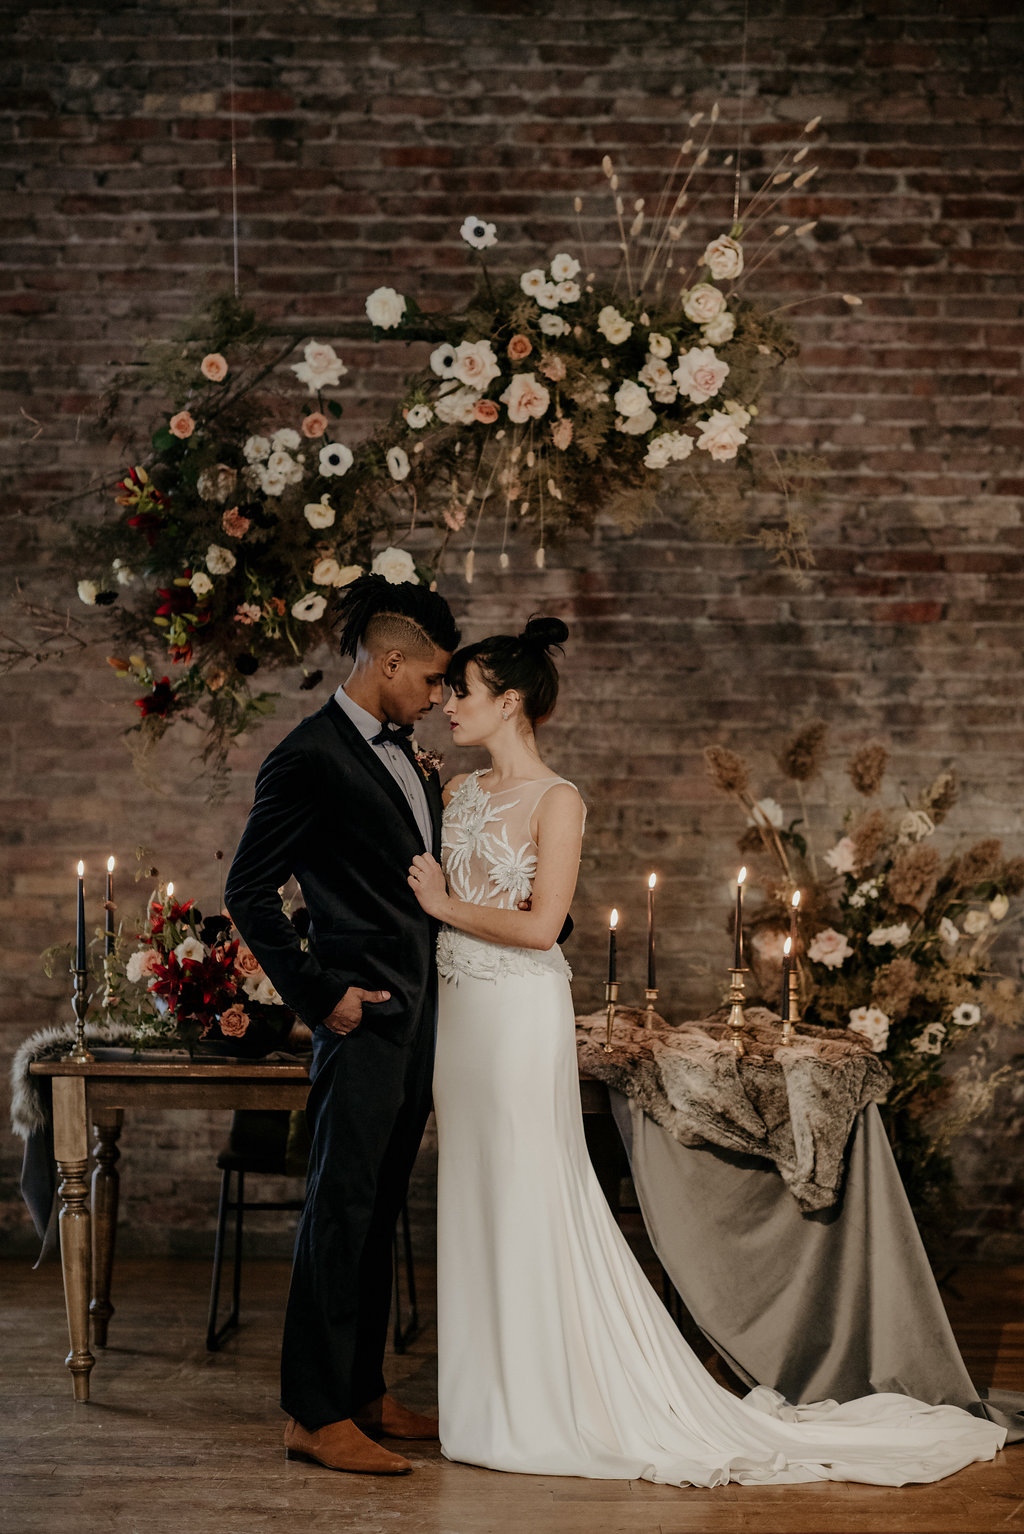 99 Sudbury, Barrie Wedding Planner, Wedding Designer, Elopement, Wedding Planner, Toronto Wedding Planner, Floral Backdrop, Romantic Elopement